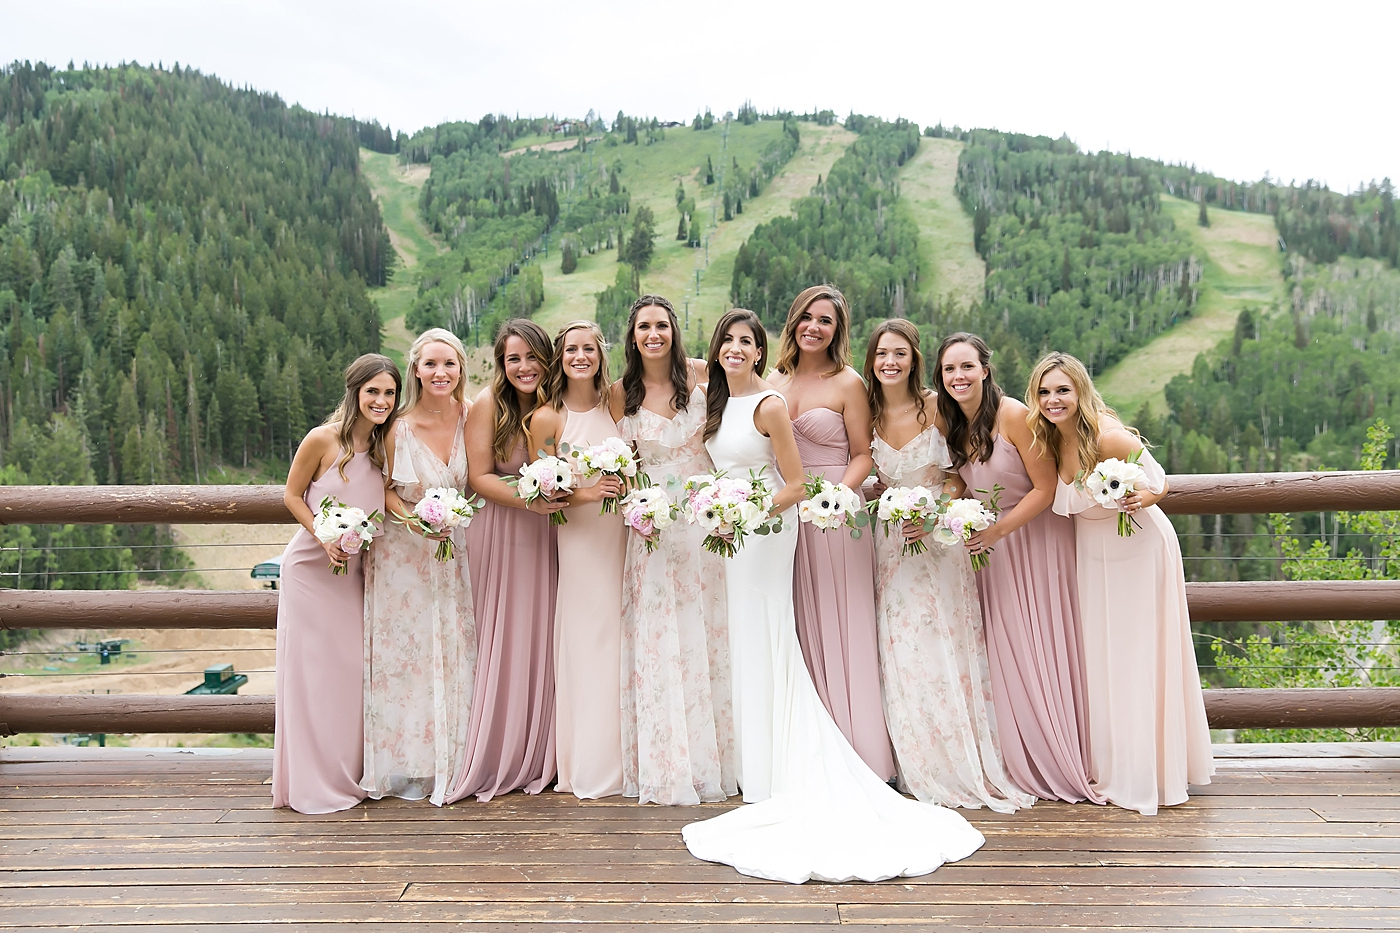 Romantic Mountain Wedding_Deer Valley Weddings_Park City Wedding Planner_MelissaFancy_0081.jpg